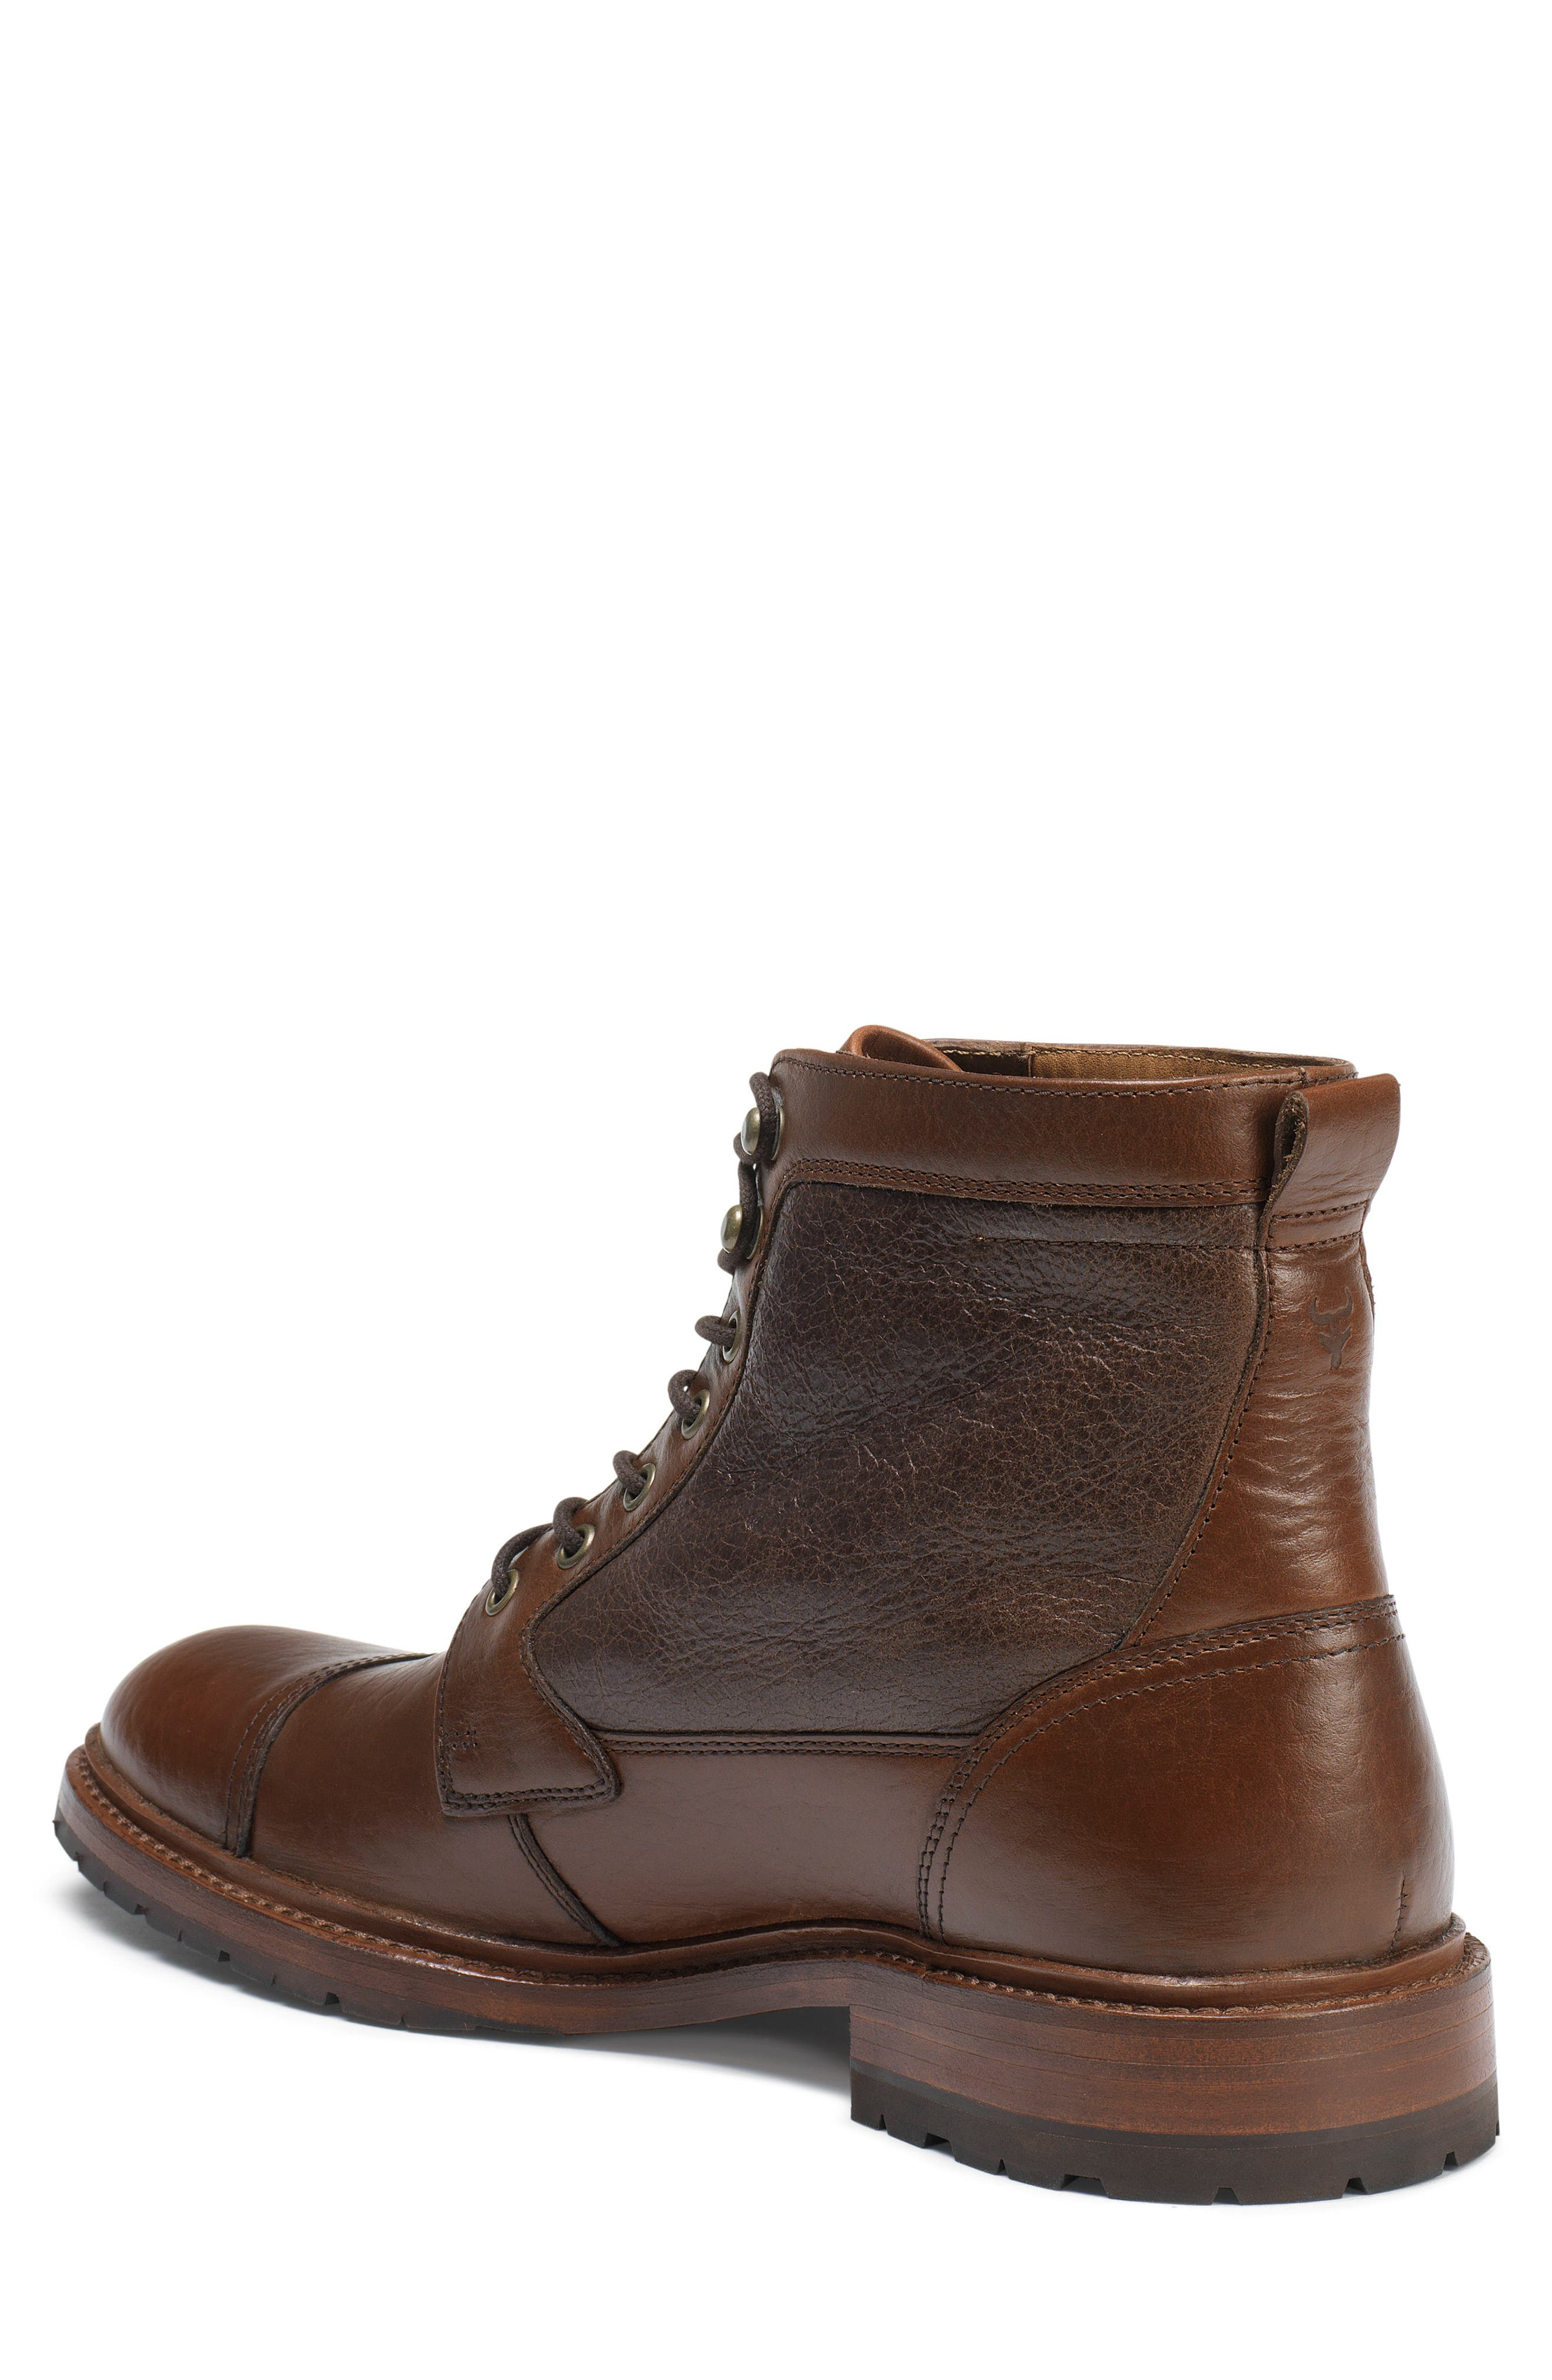 66f09b9523d Mens Trask Boots | Nordstrom